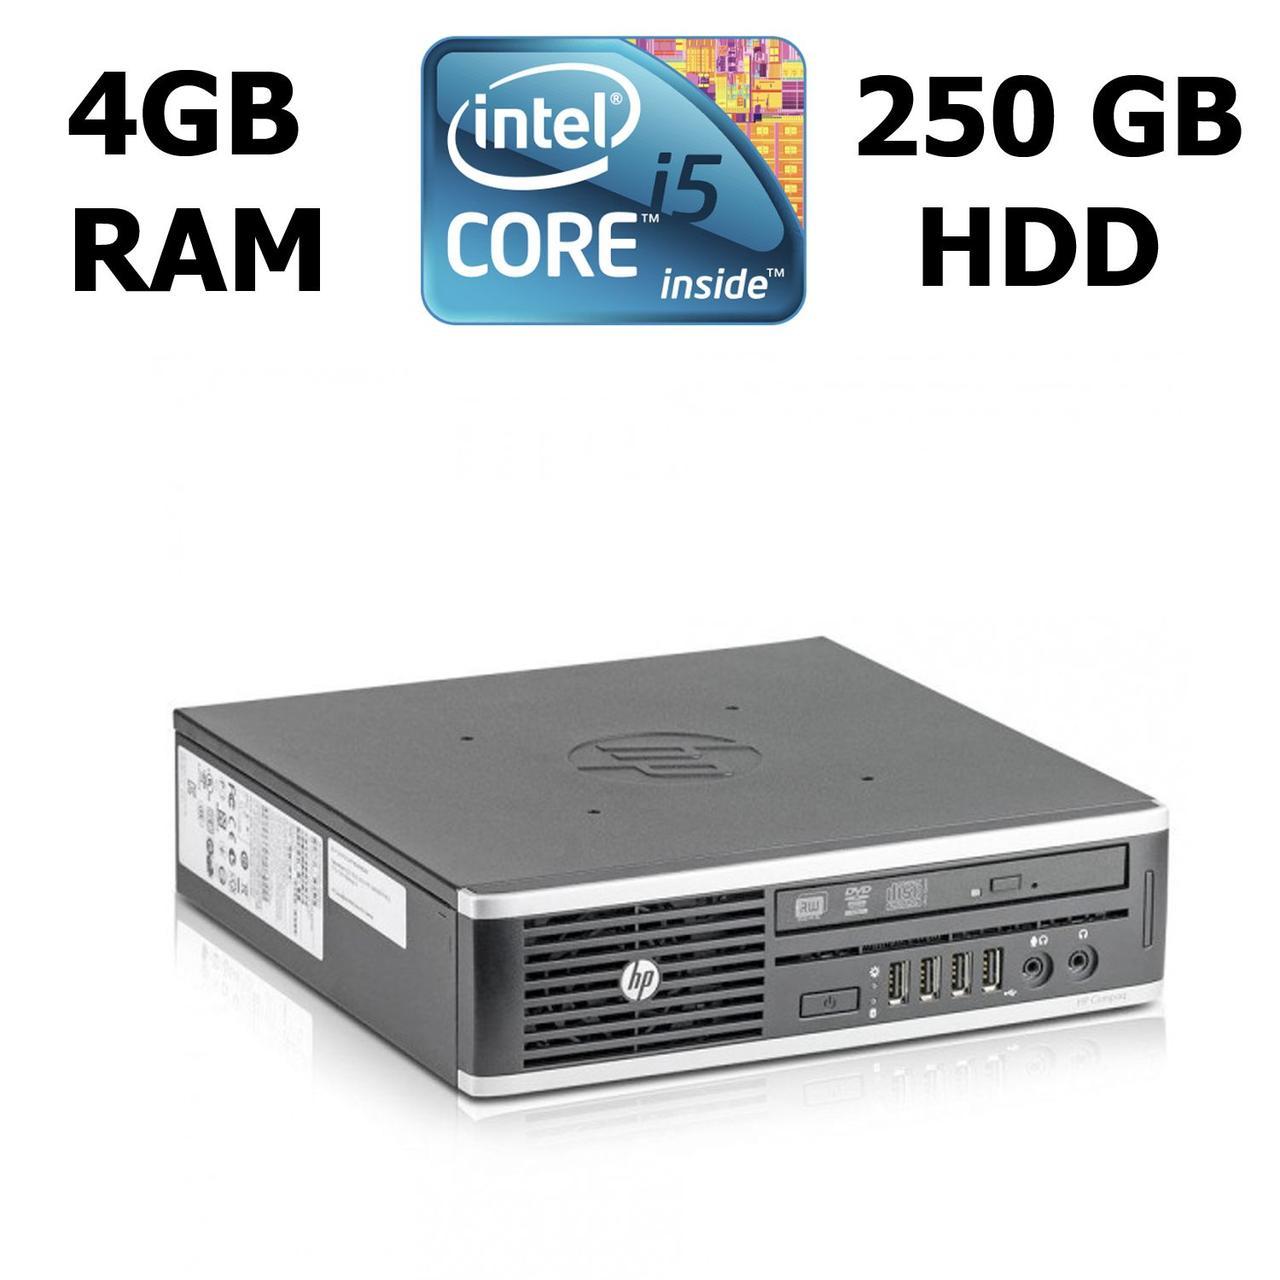 Неттоп HP Compaq 8200 USFF / Intel® Core™ i5-2500S (4 ядра по 2.7 - 3.7 GHz) / 4GB DDR3 / 250 GB HDD